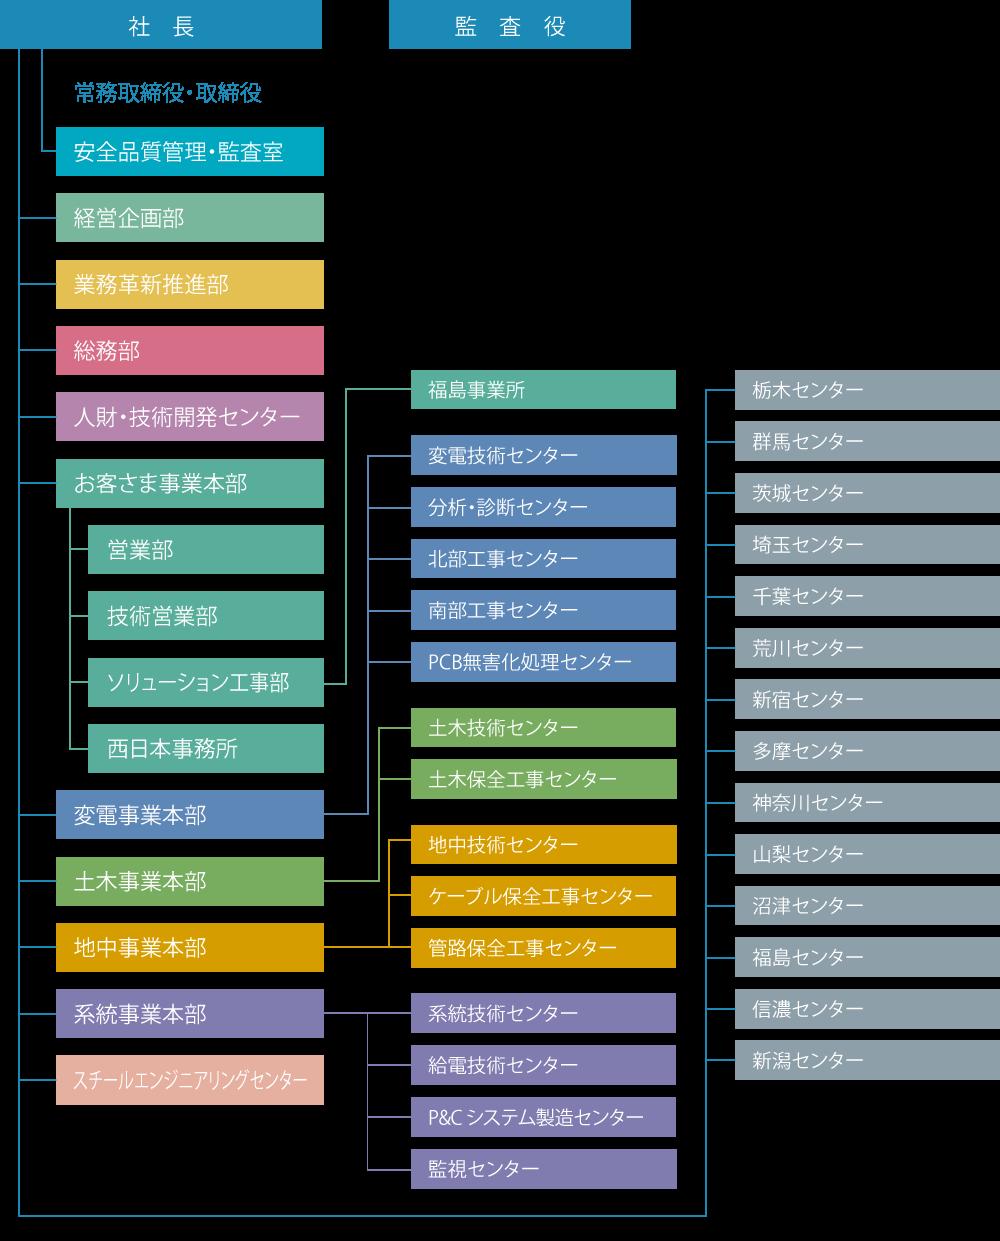 TDSの組織図